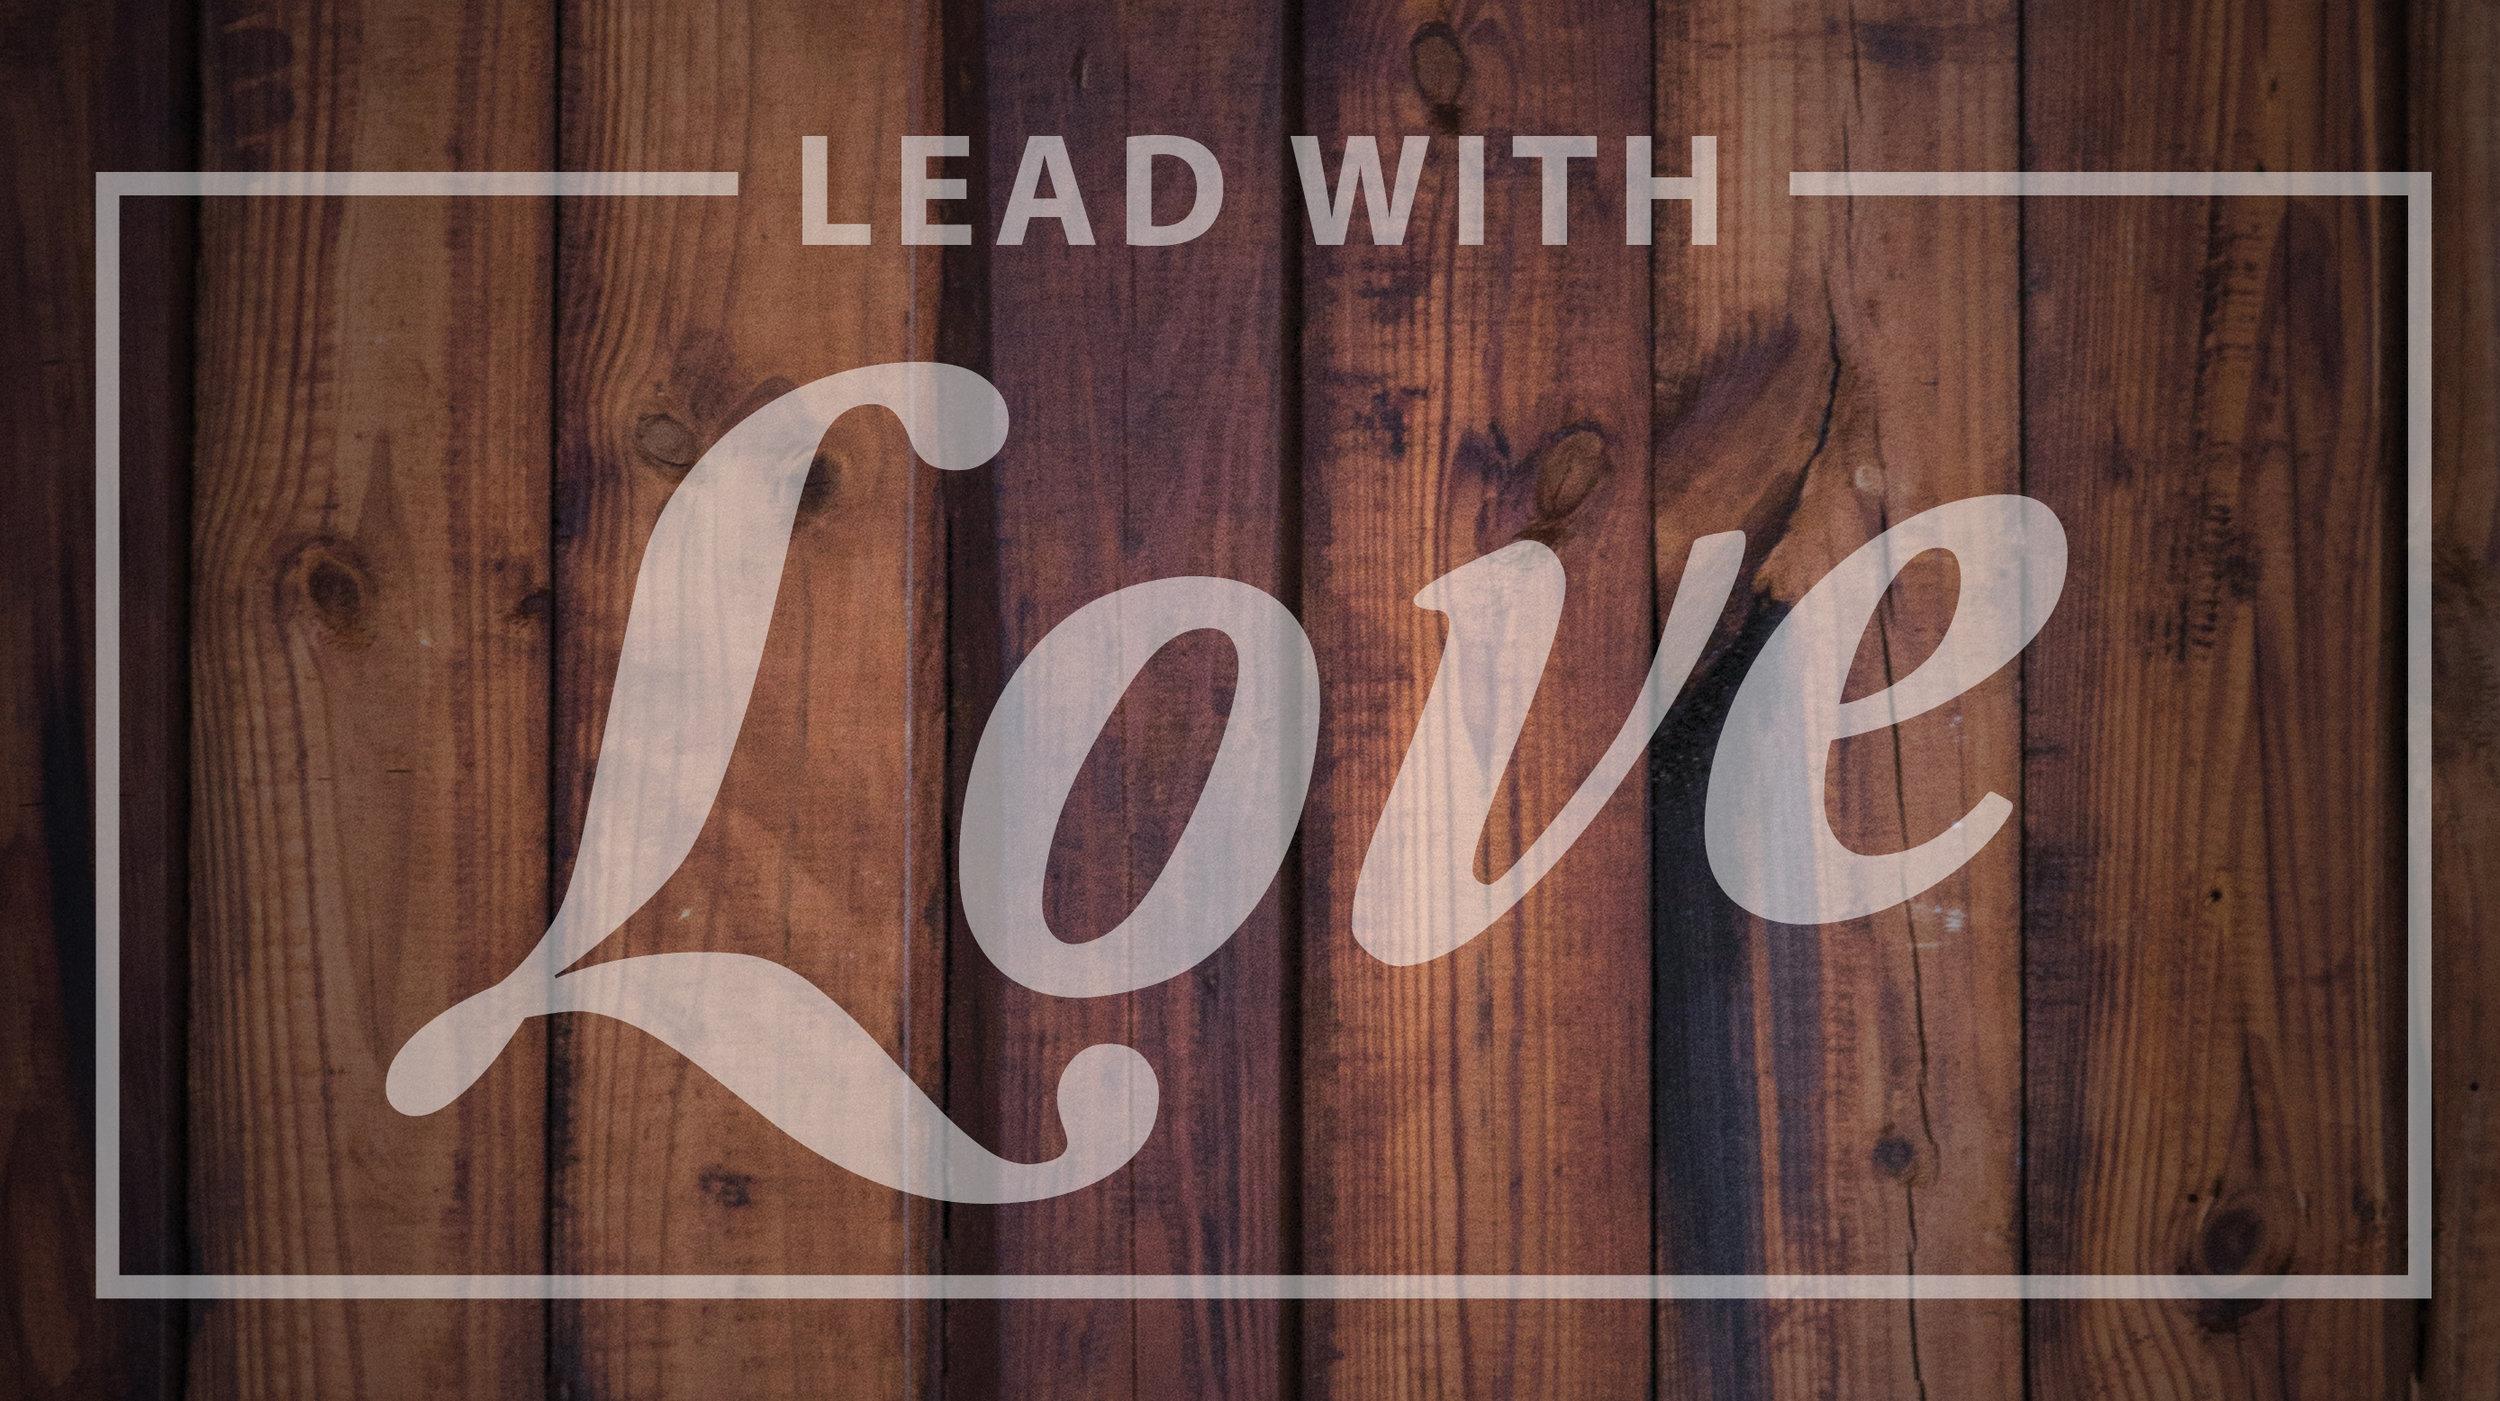 48274_Berkeley - Lead With Love-01_121216.jpg